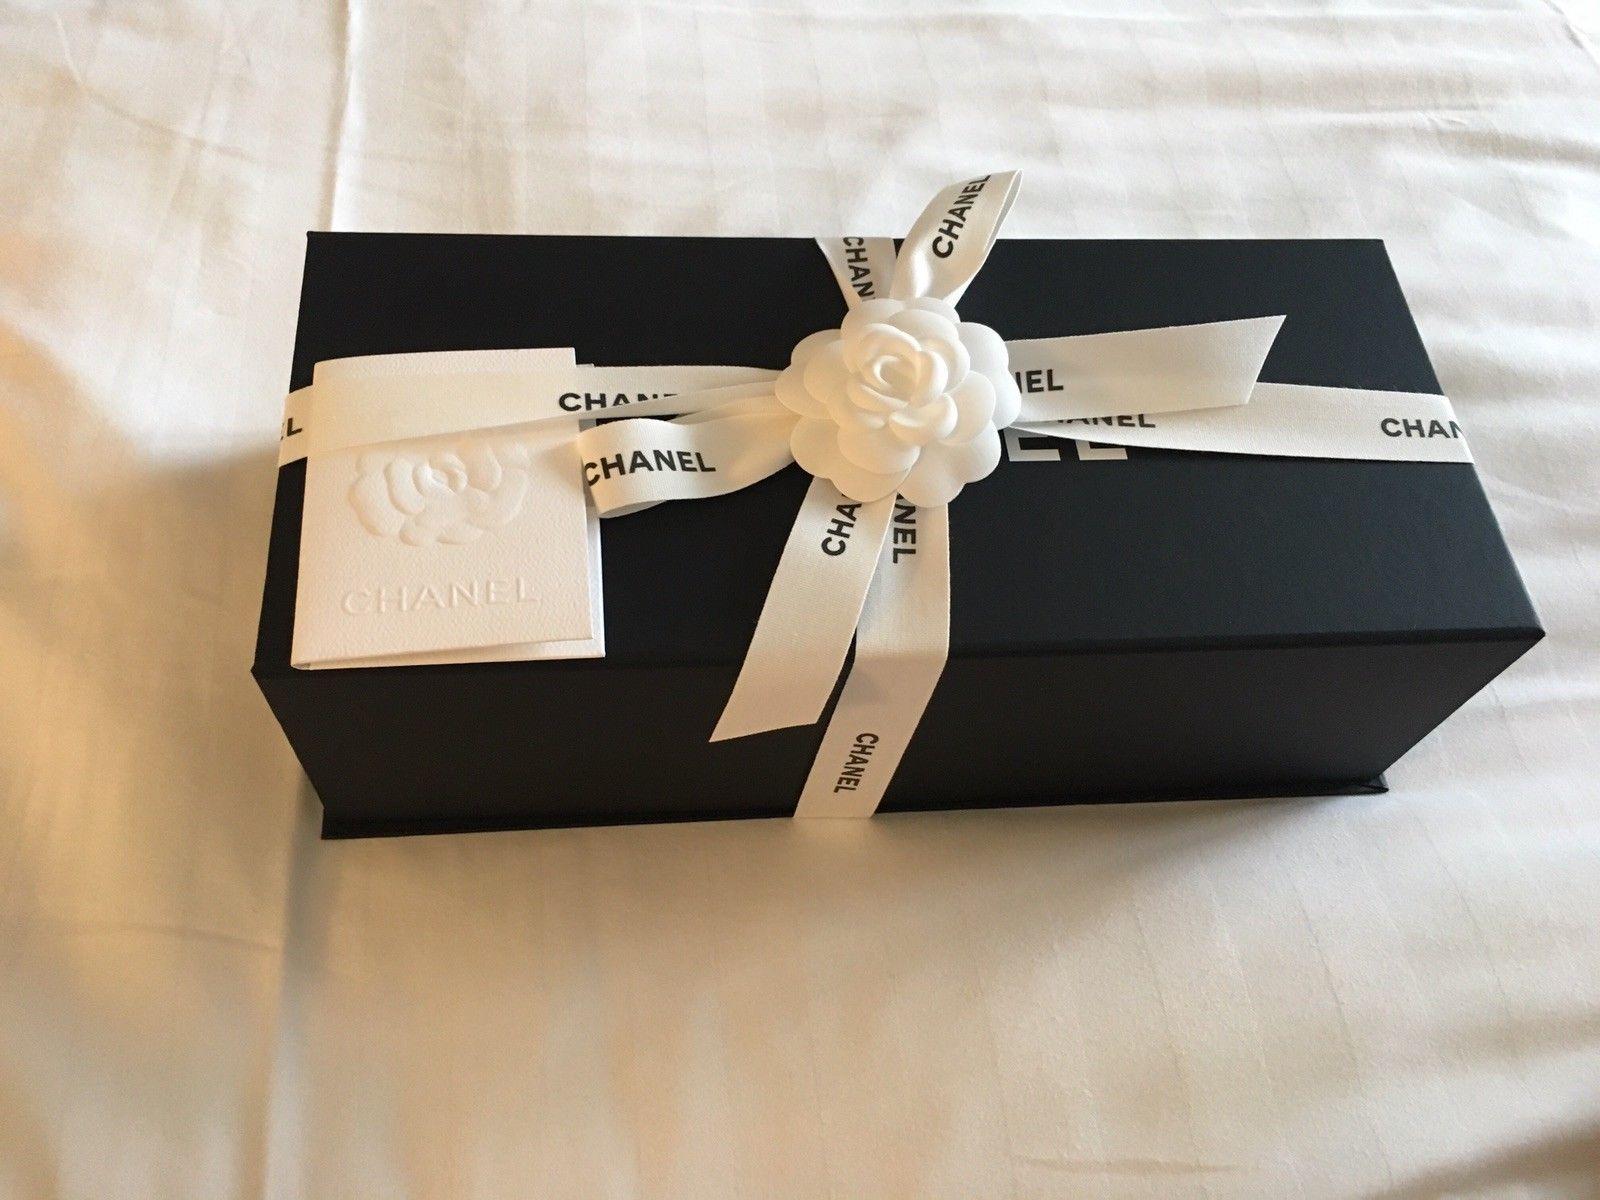 B chanel classic mini flap bag in caviar with silver hardware